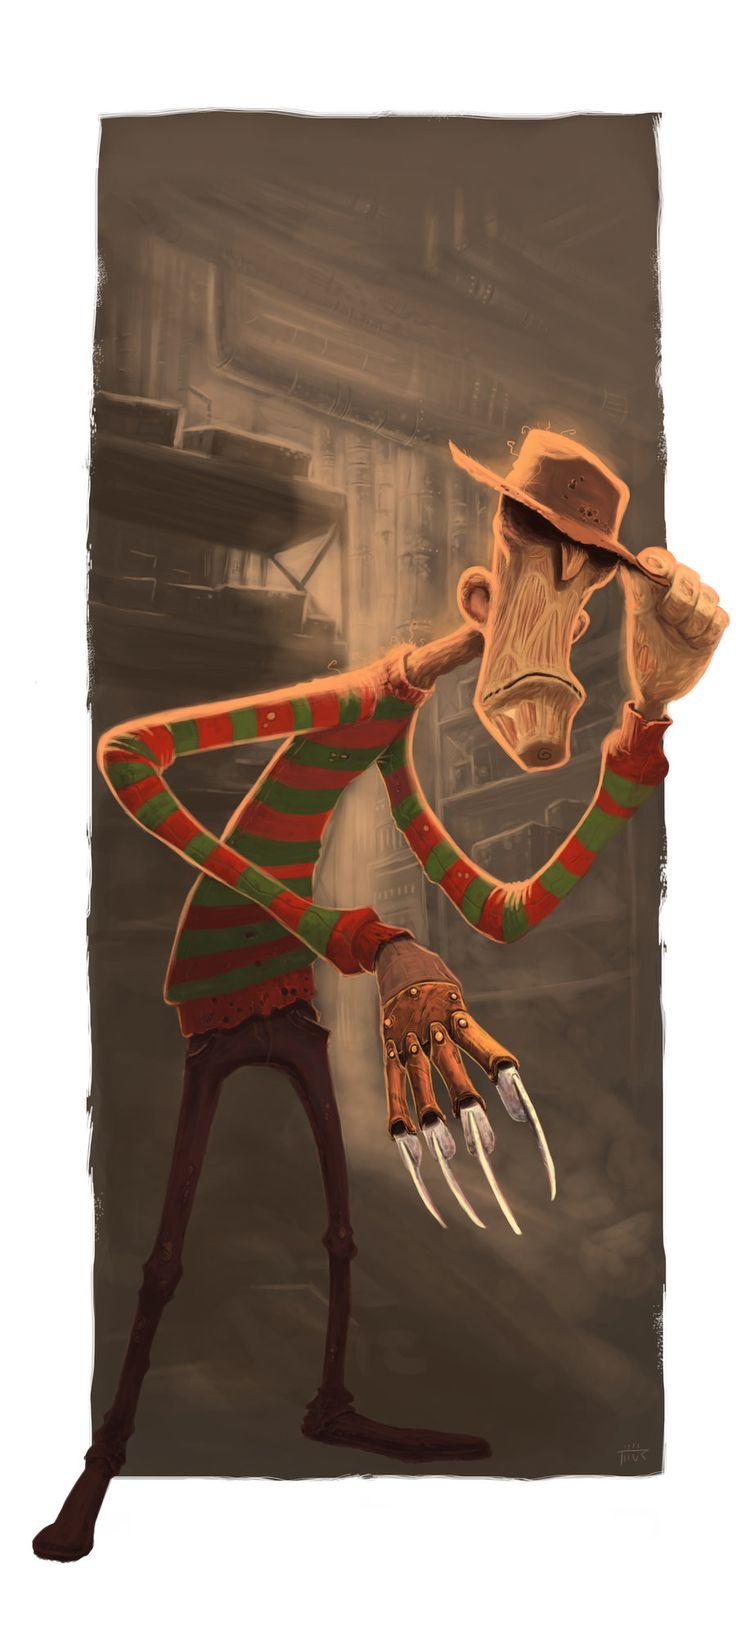 Freddy Krueger by ~thurZ on deviantART